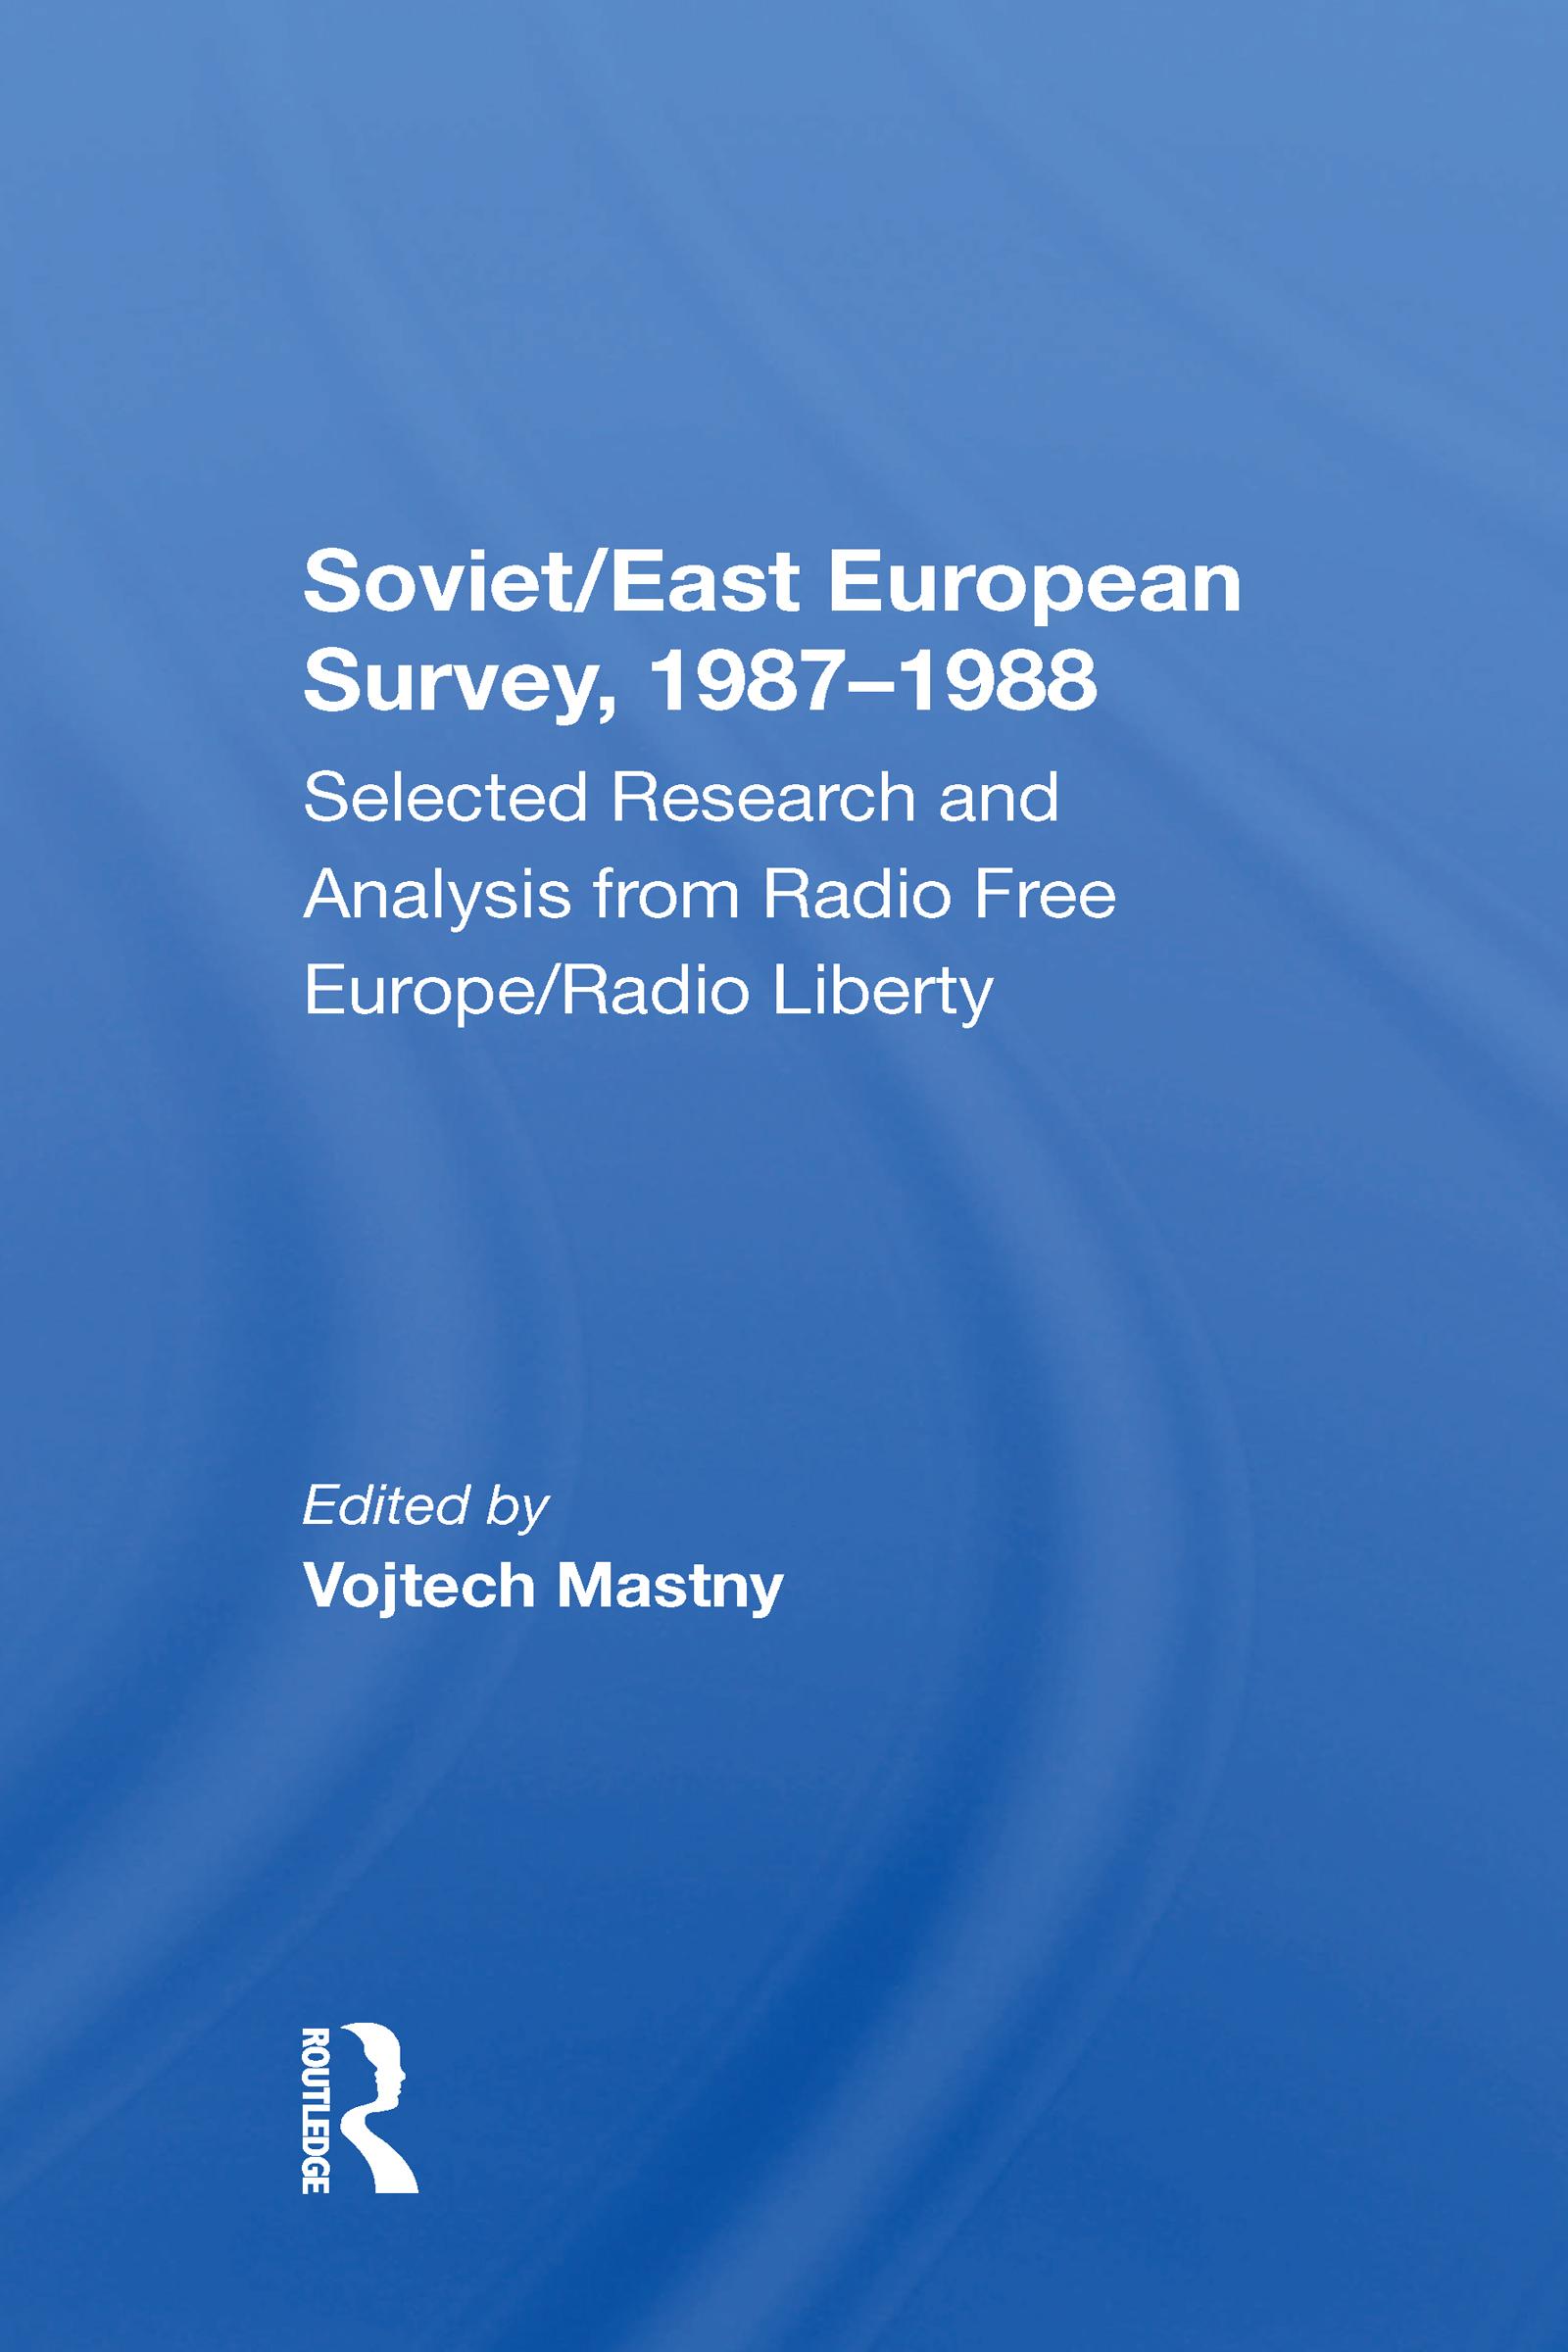 Soviet/east European Survey, 1987-1988